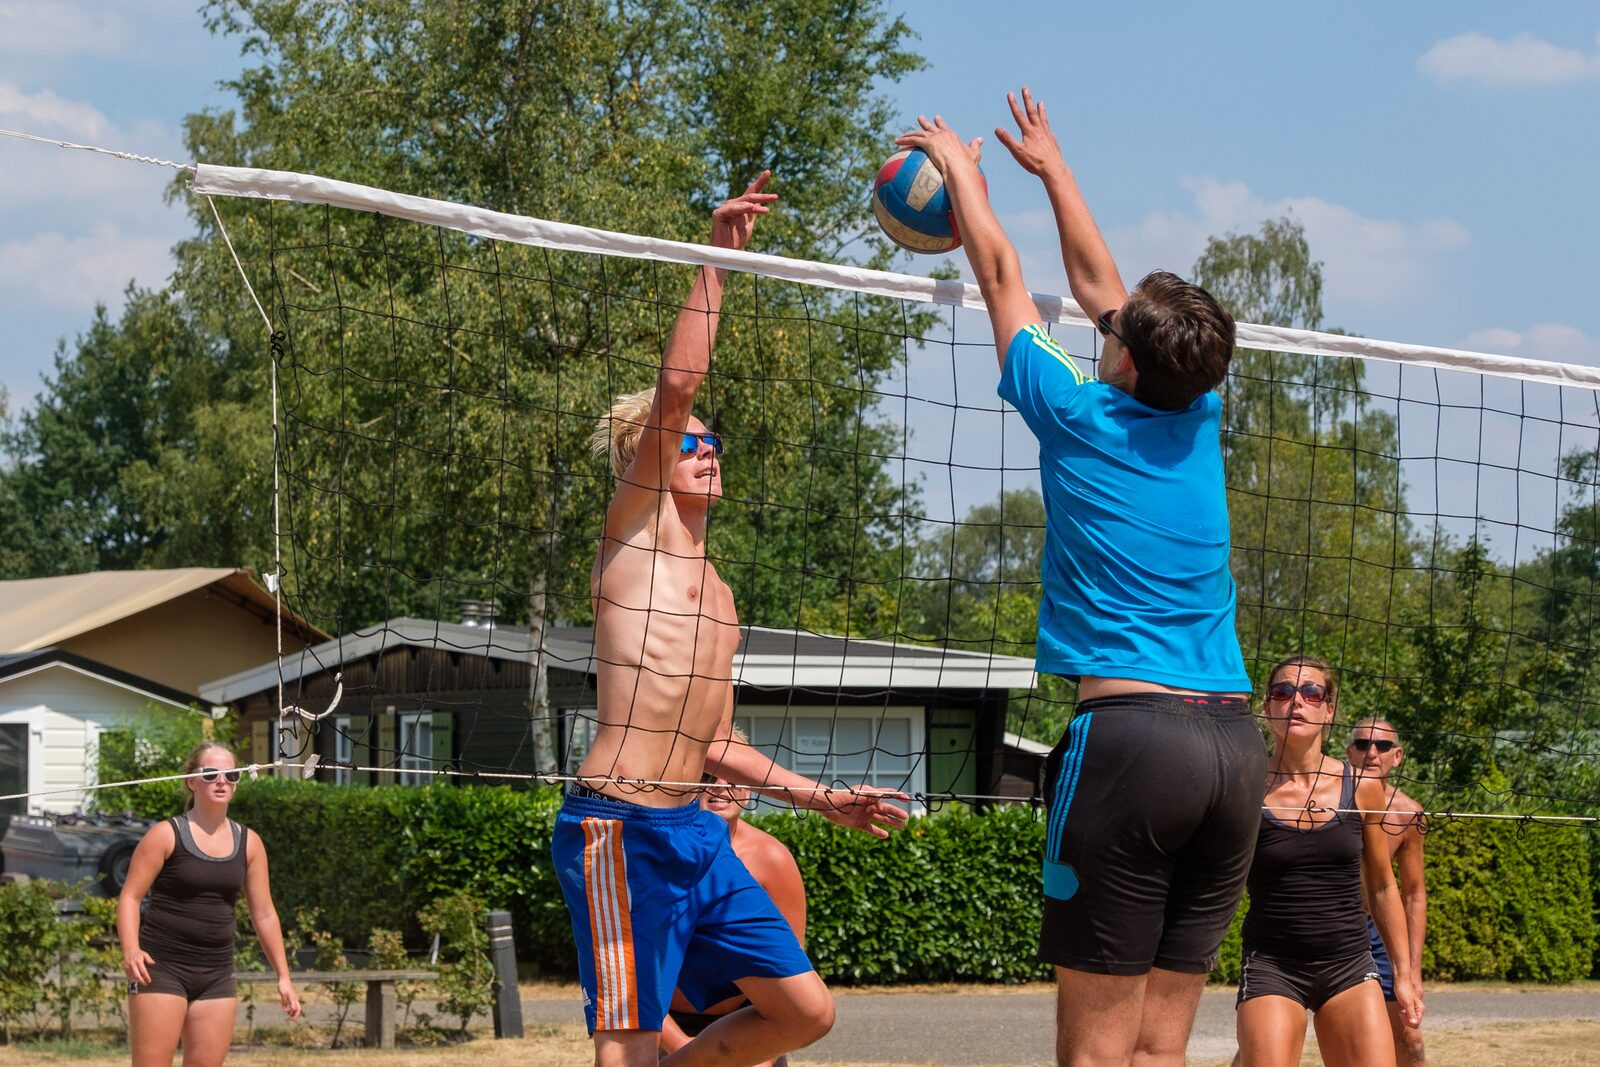 Belties volleybaltoernooi